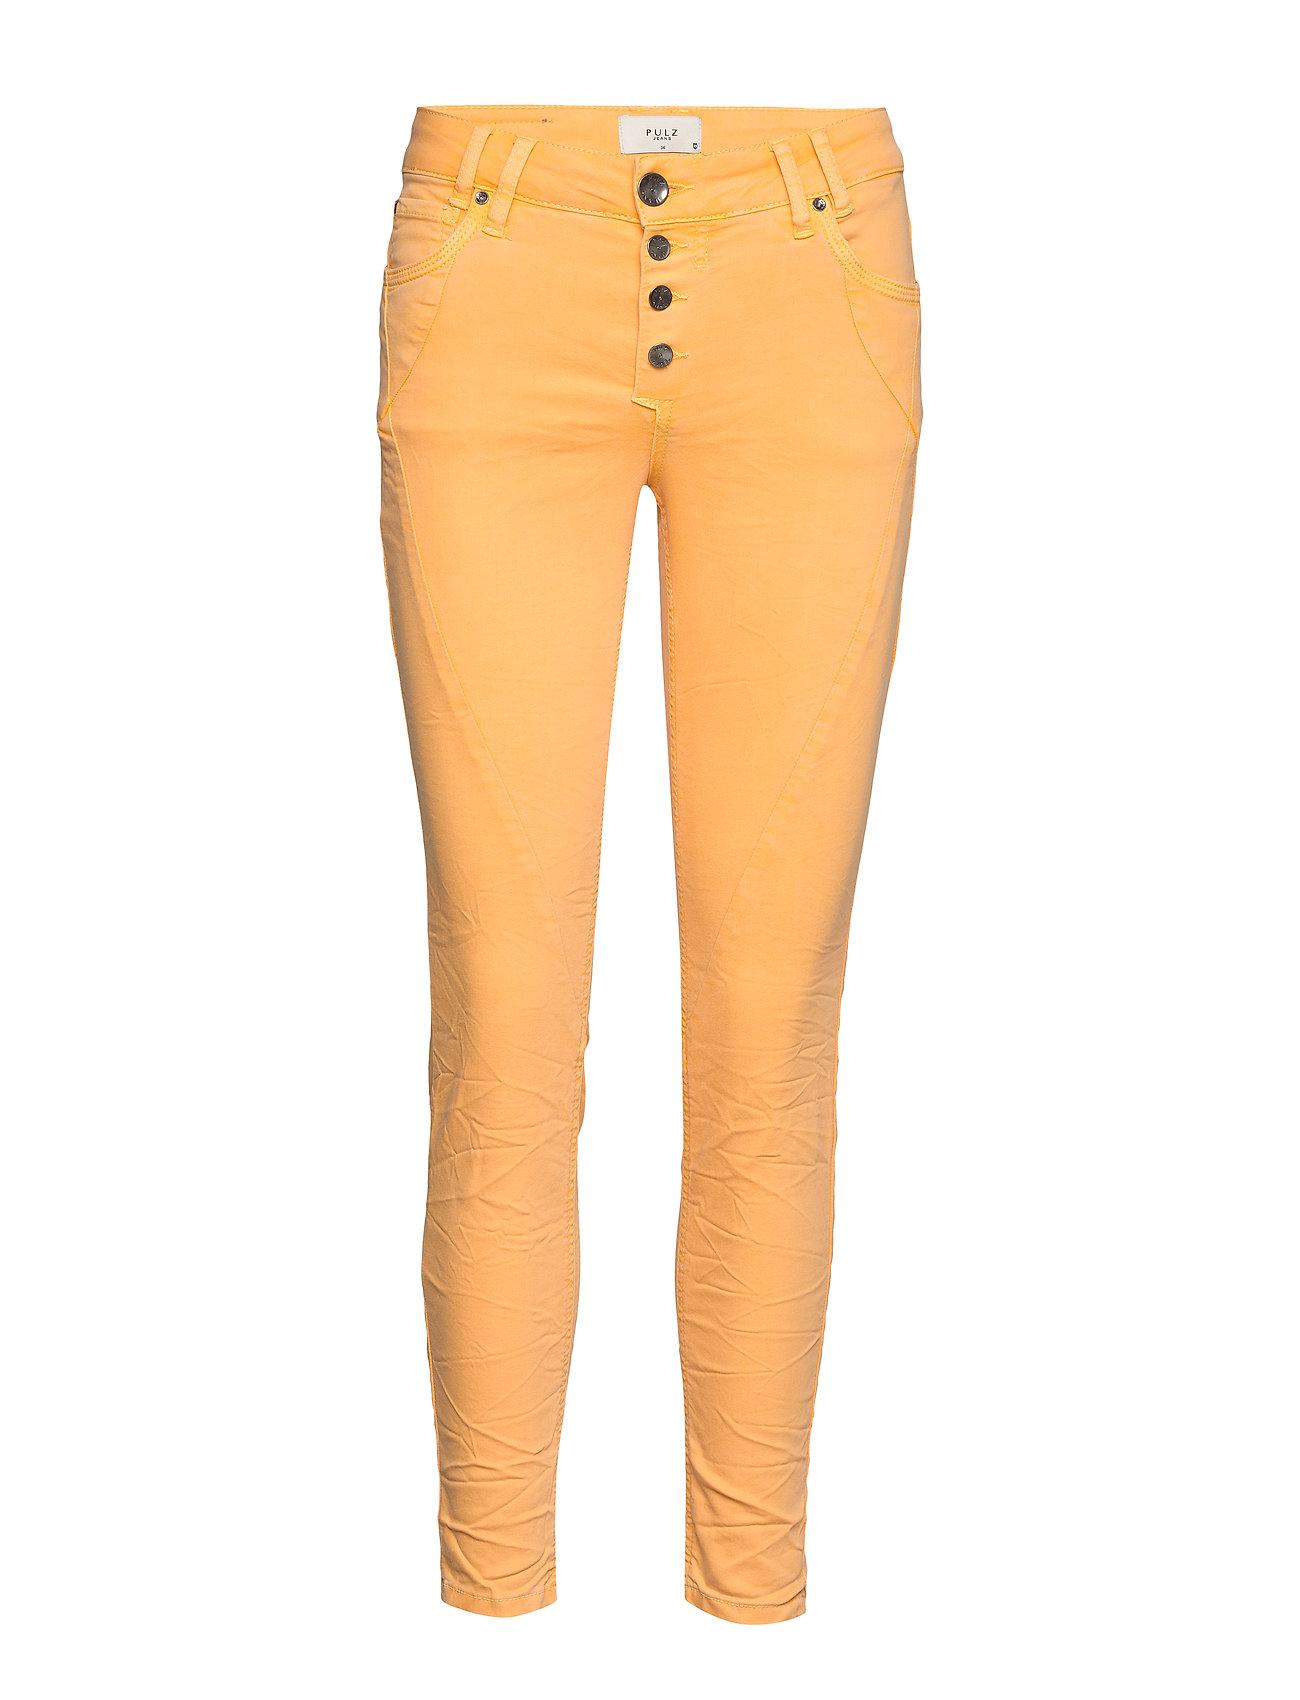 Pulz Jeans PZROSITA PANT - ARTISAN'S GOLD